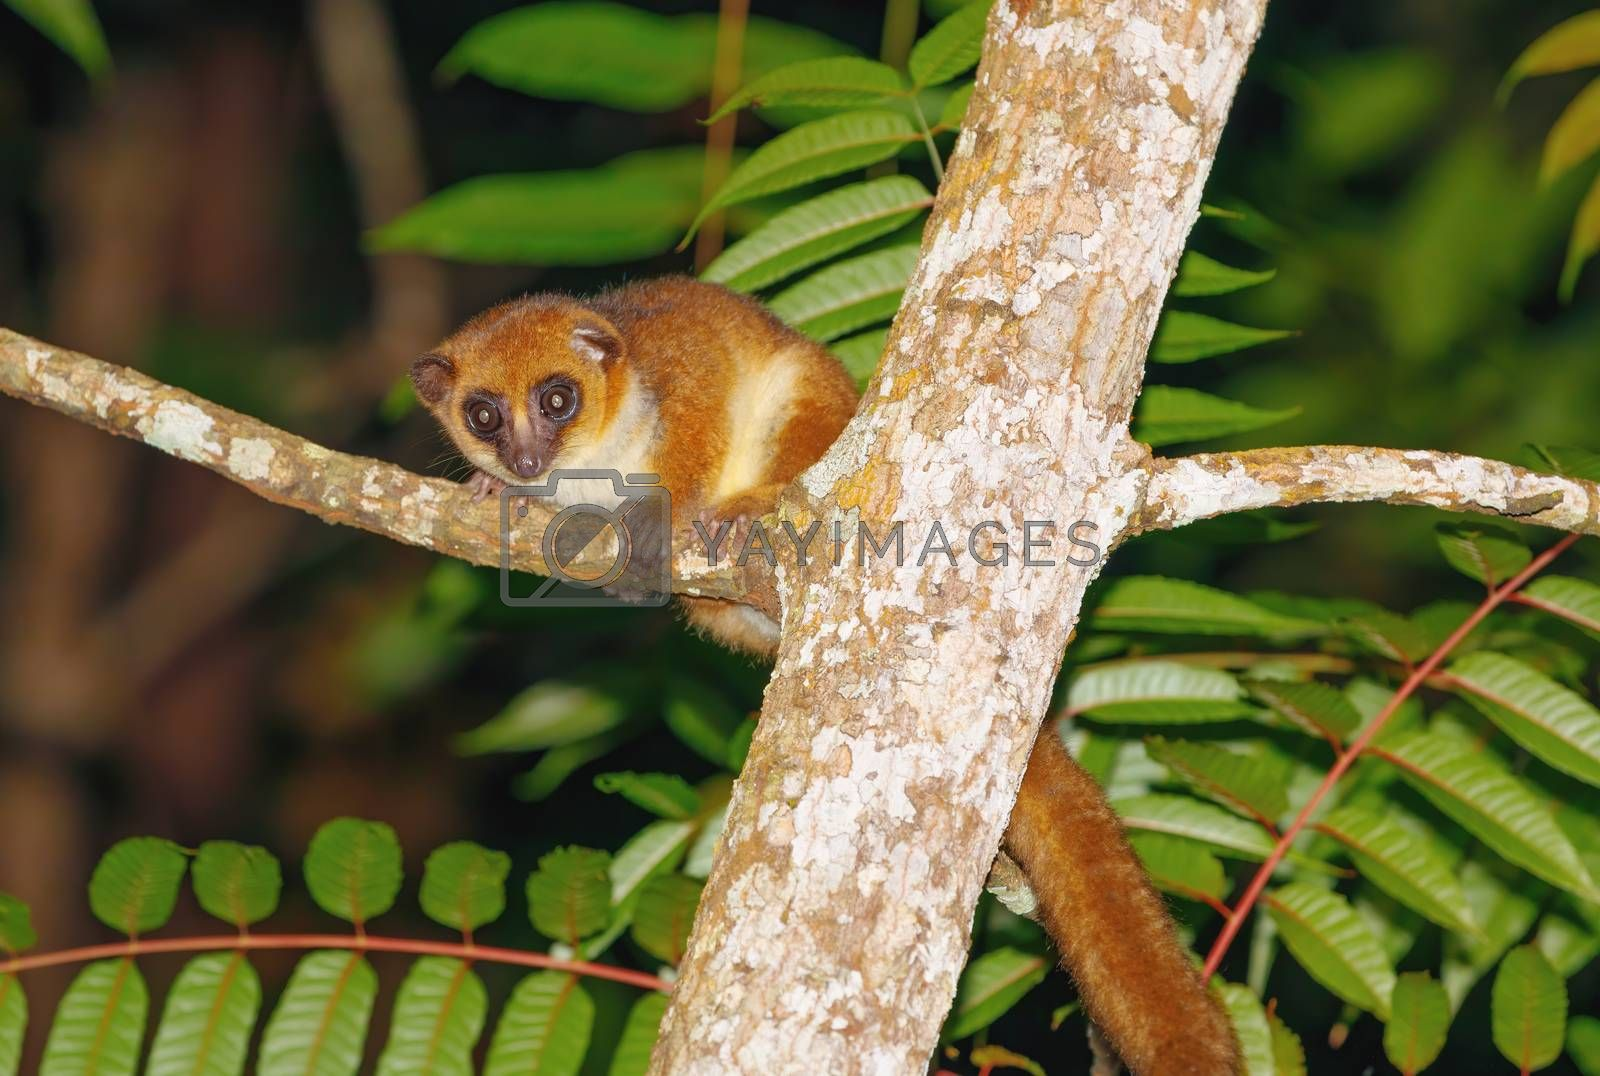 small brown mouse lemur (Microcebus rufus) at night in natural habitat, Masoala national park, Madagascar wildlife